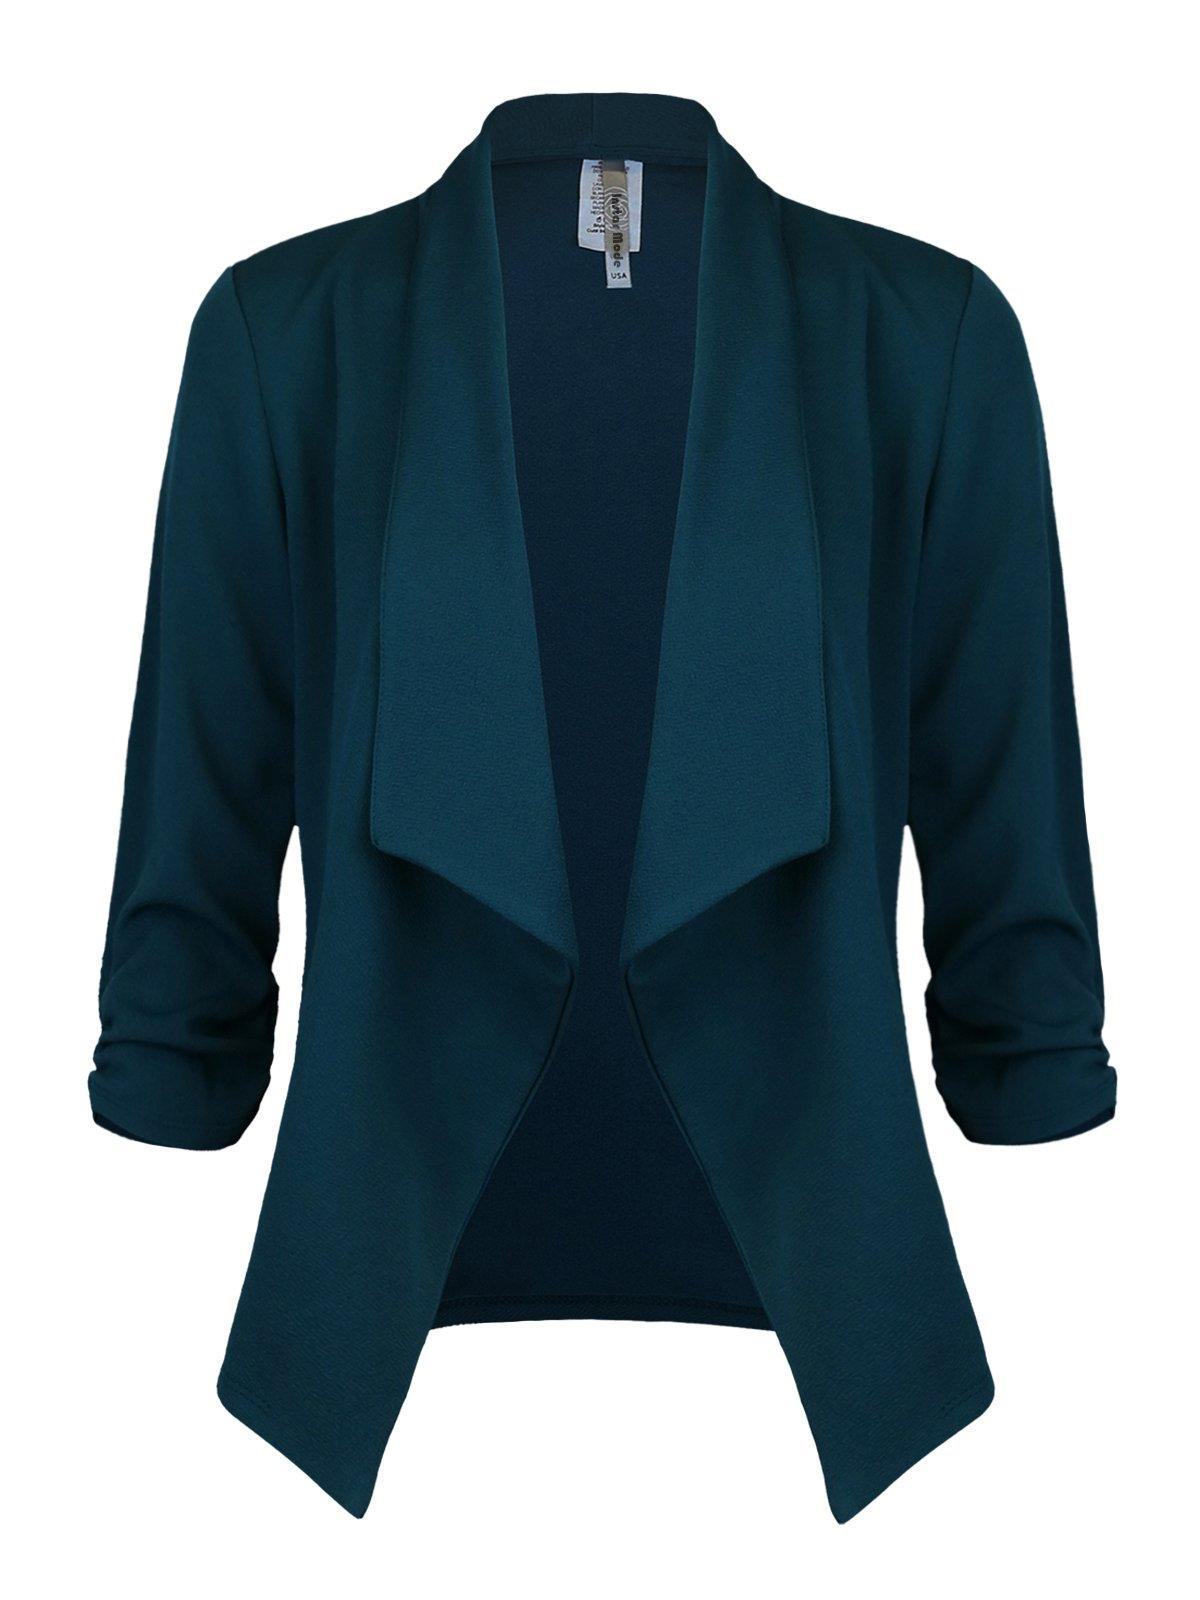 Instar Mode Women's Versatile Business Attire Blazers in Varies Styles (B12316 Green, Medium) by Instar Mode (Image #1)